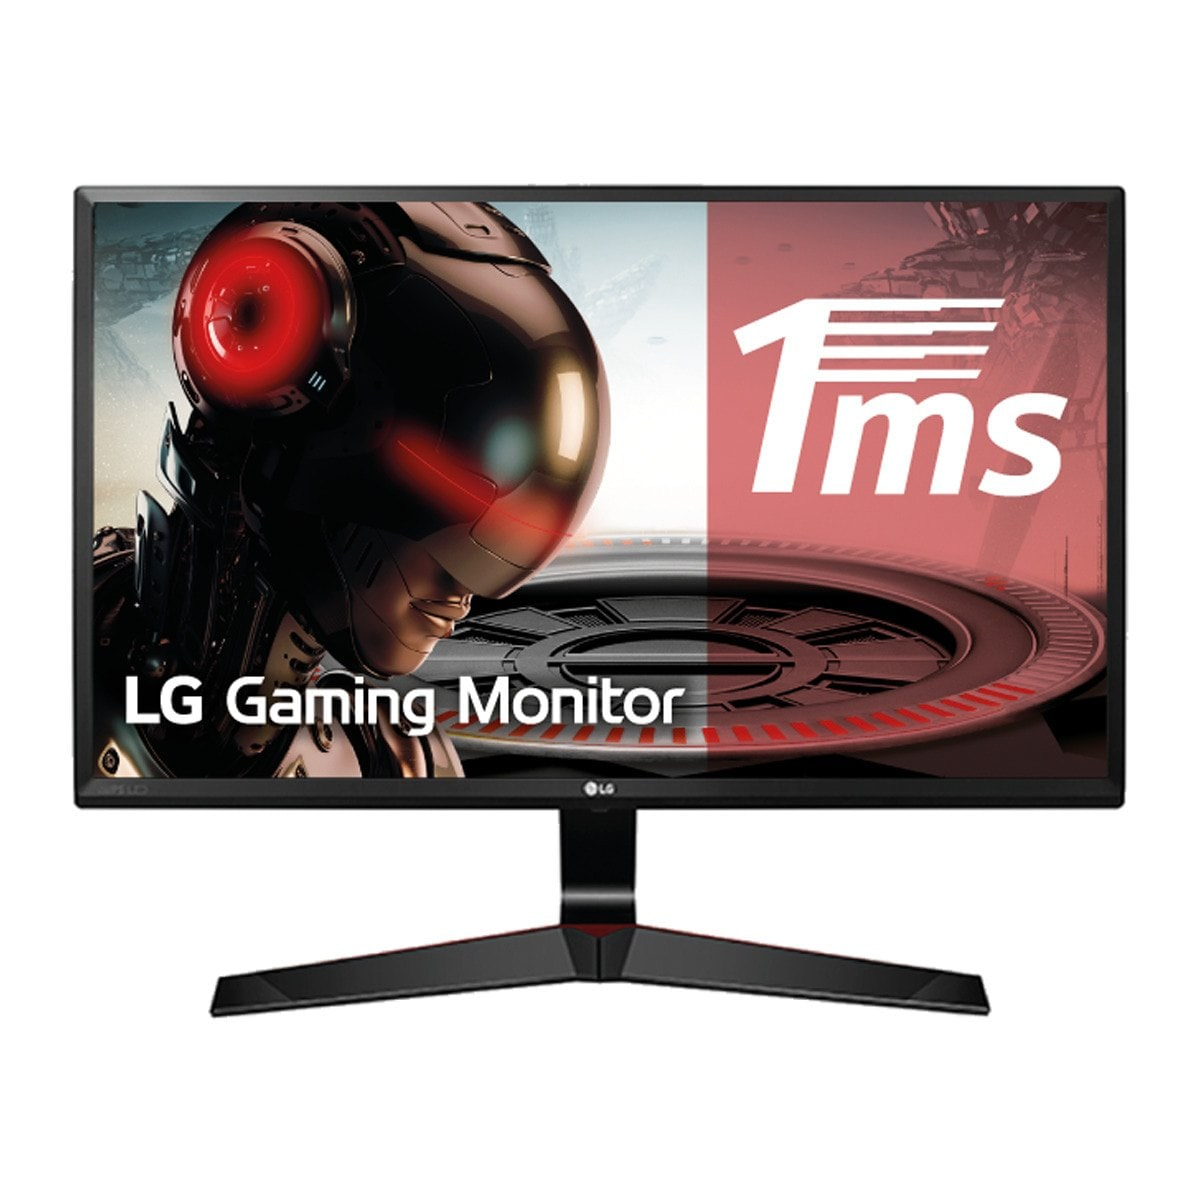 "Monitor Gaming LG de 24"" FullHD"